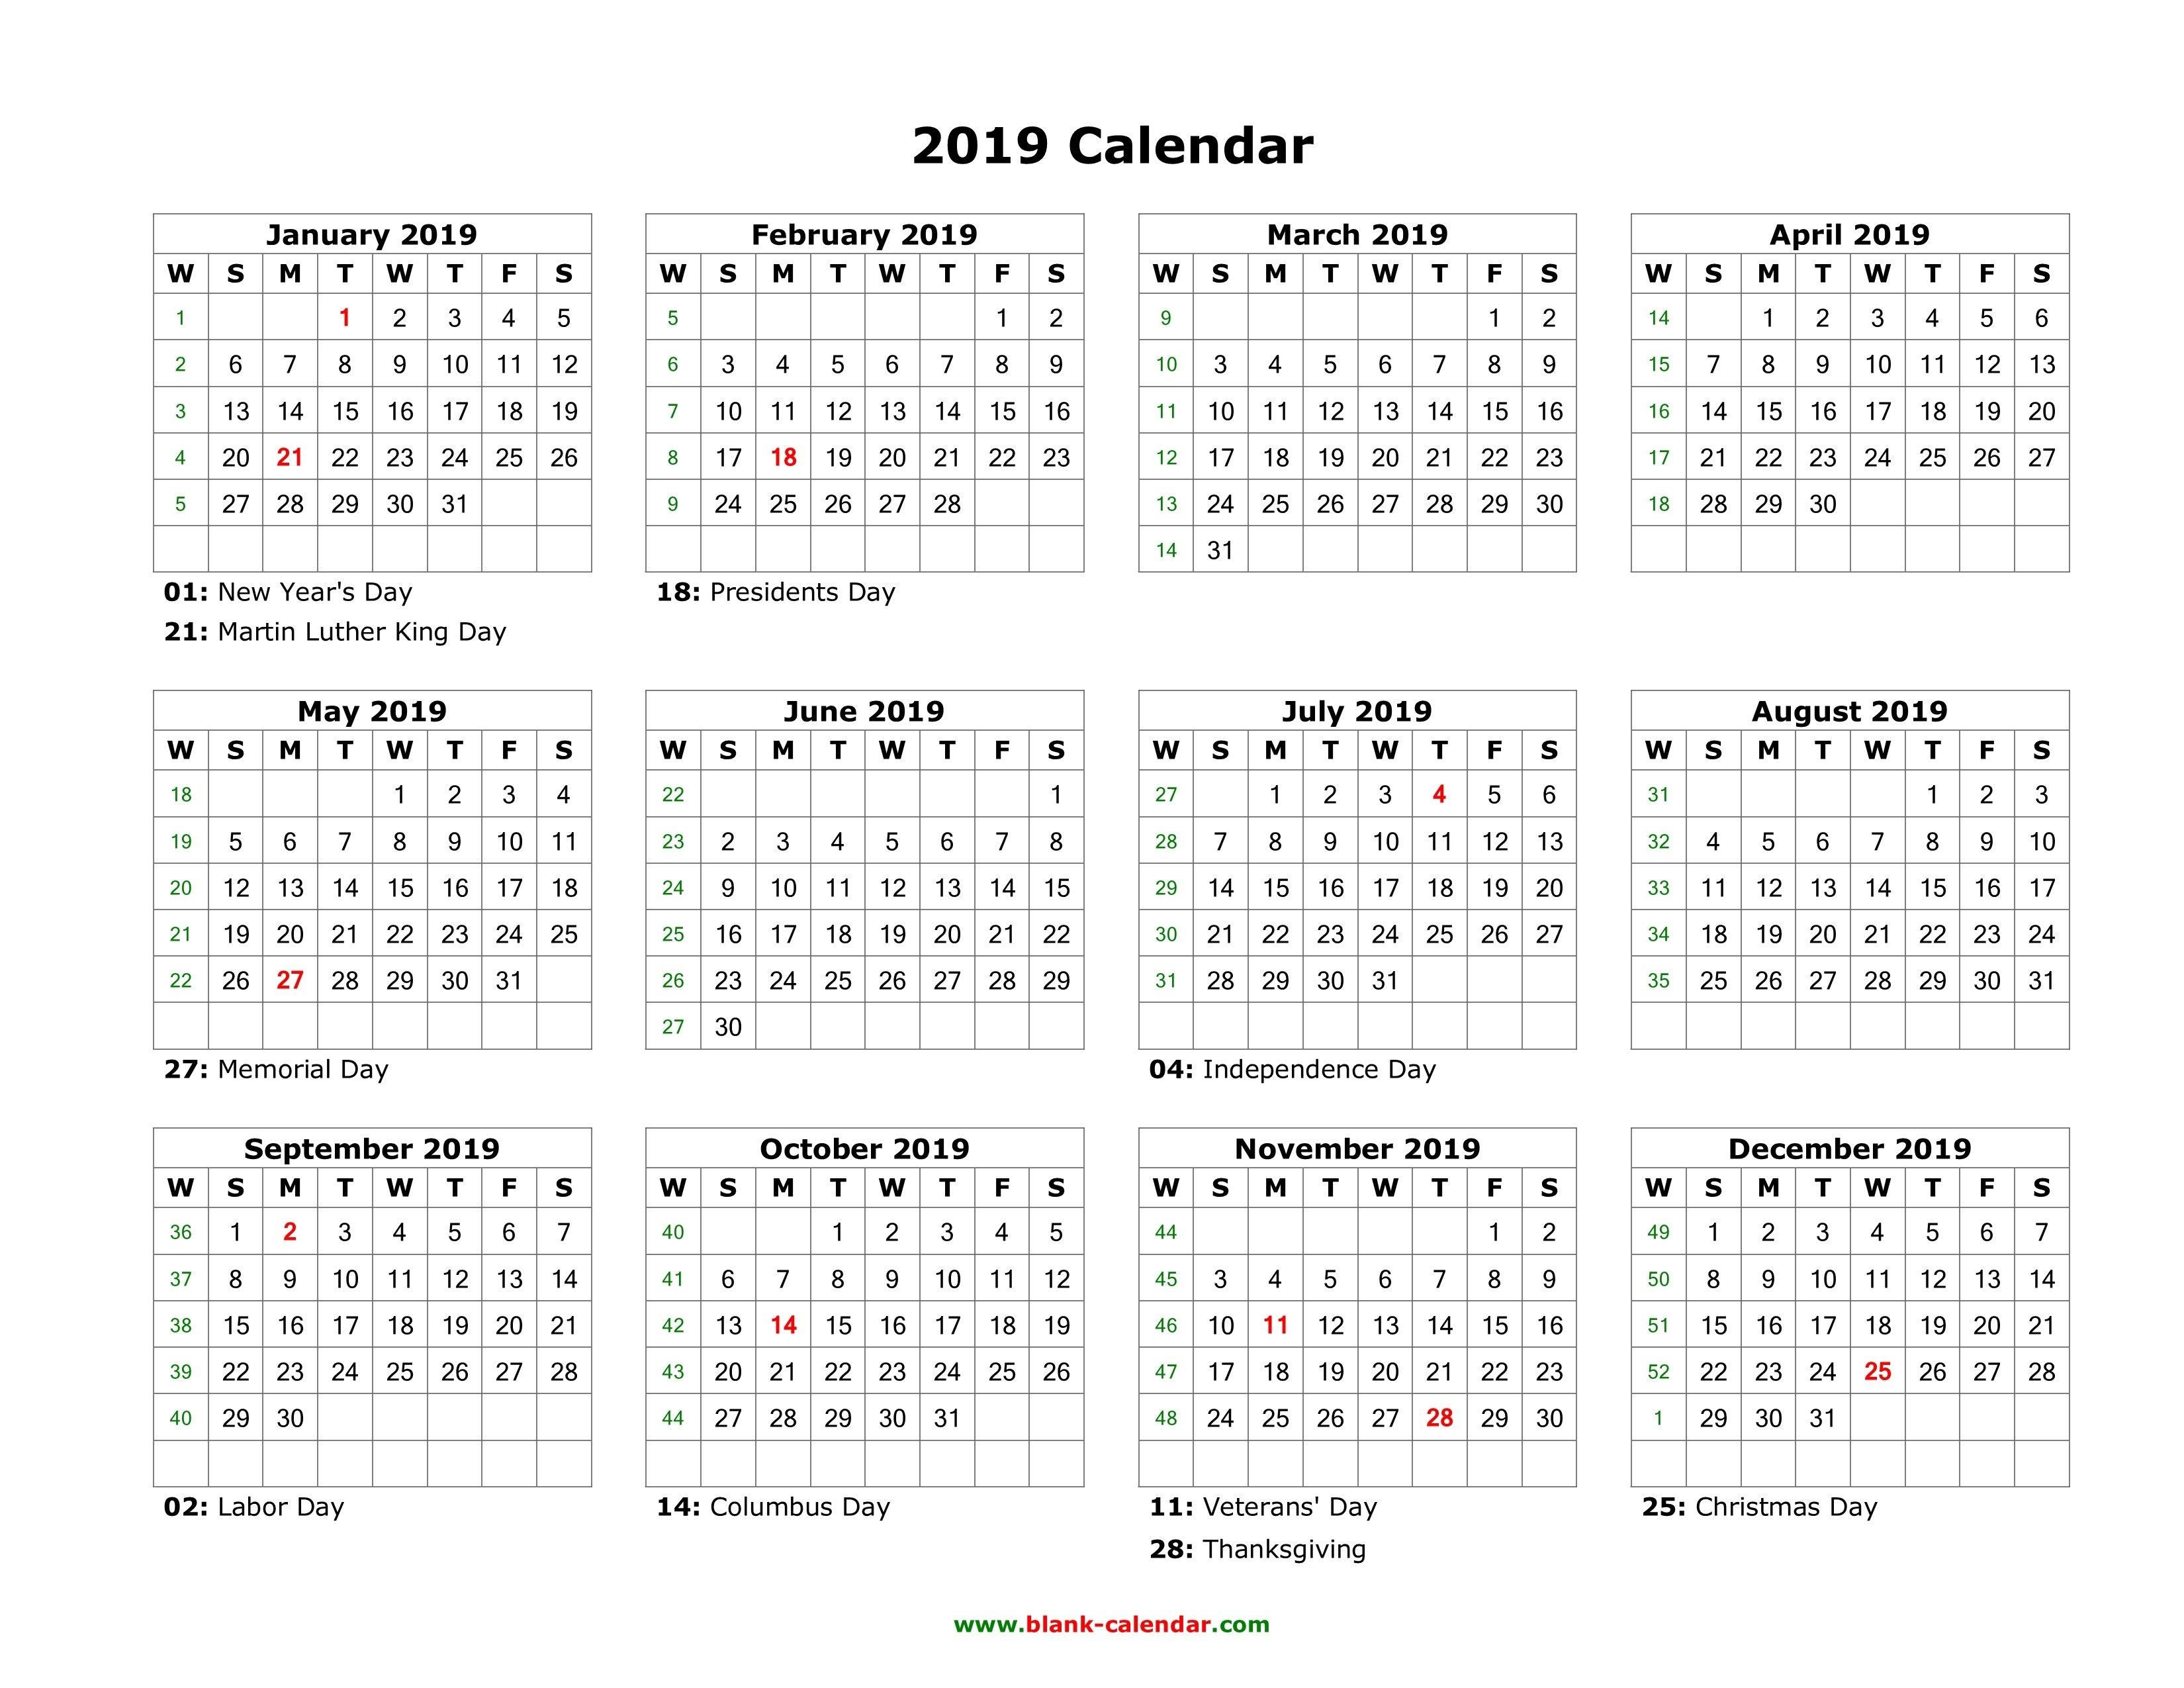 Blank Calendar 2019   Free Download Calendar Templates Calendar 2019 Yearly Template